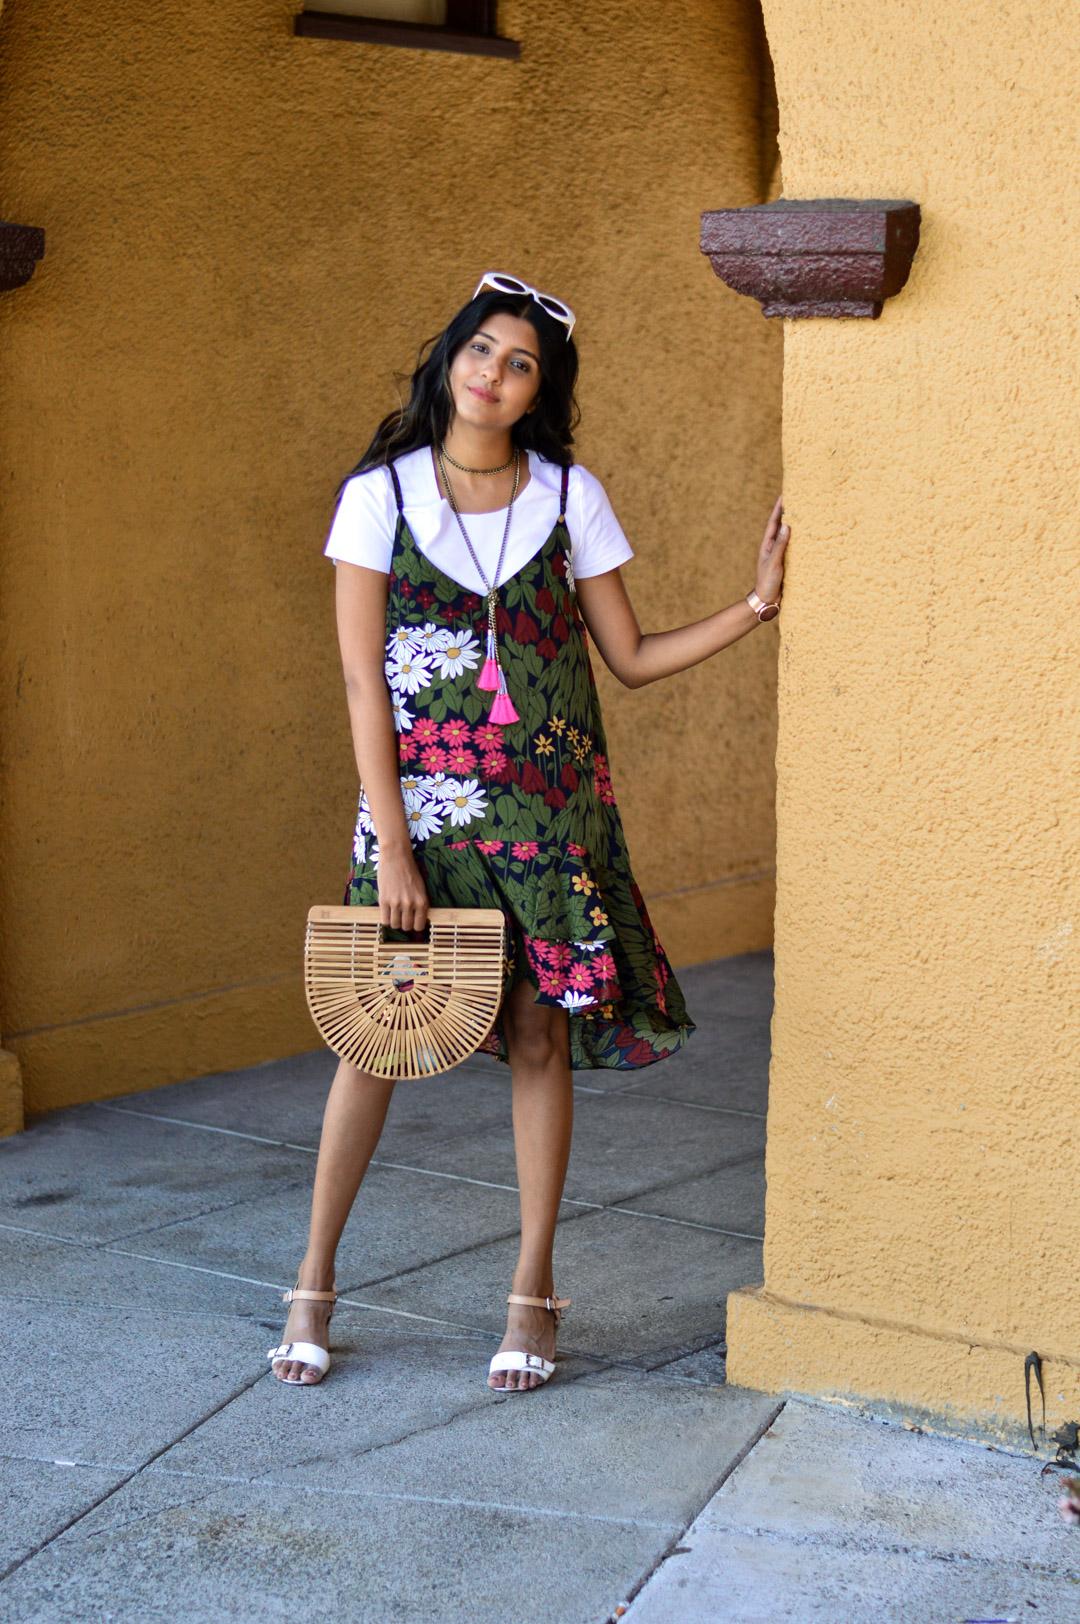 fall-florals-slip-dress-fashion-blogger-retro-chic 3